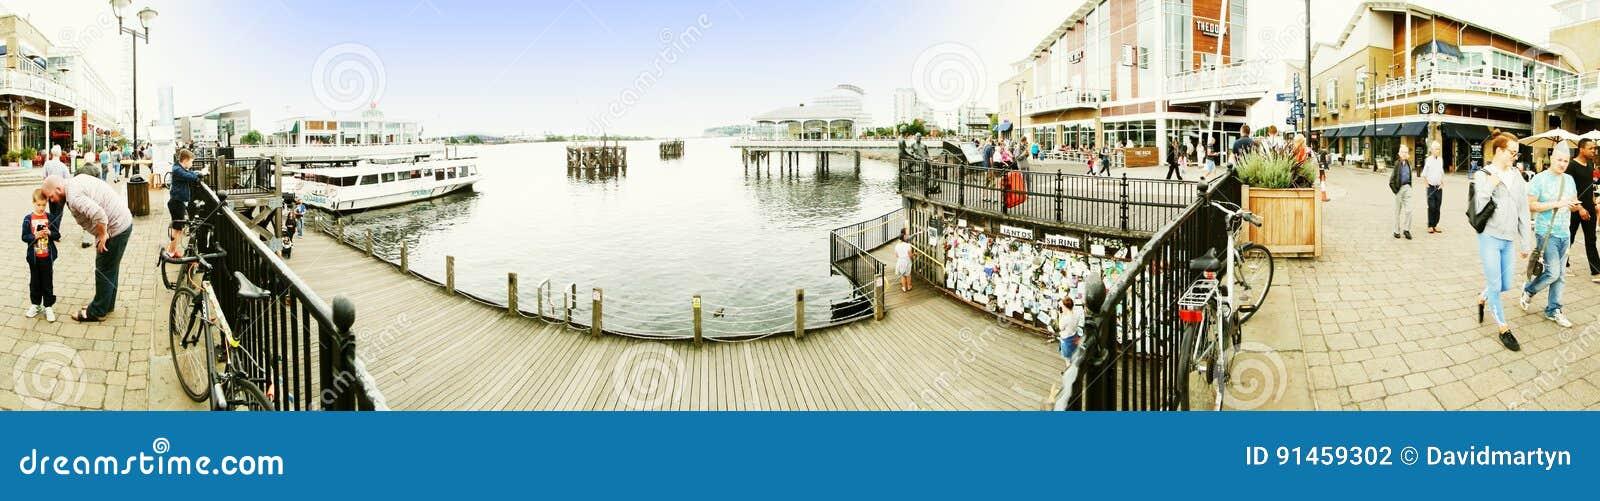 EXKLUSIV - Panorama von Cardiff-Docks